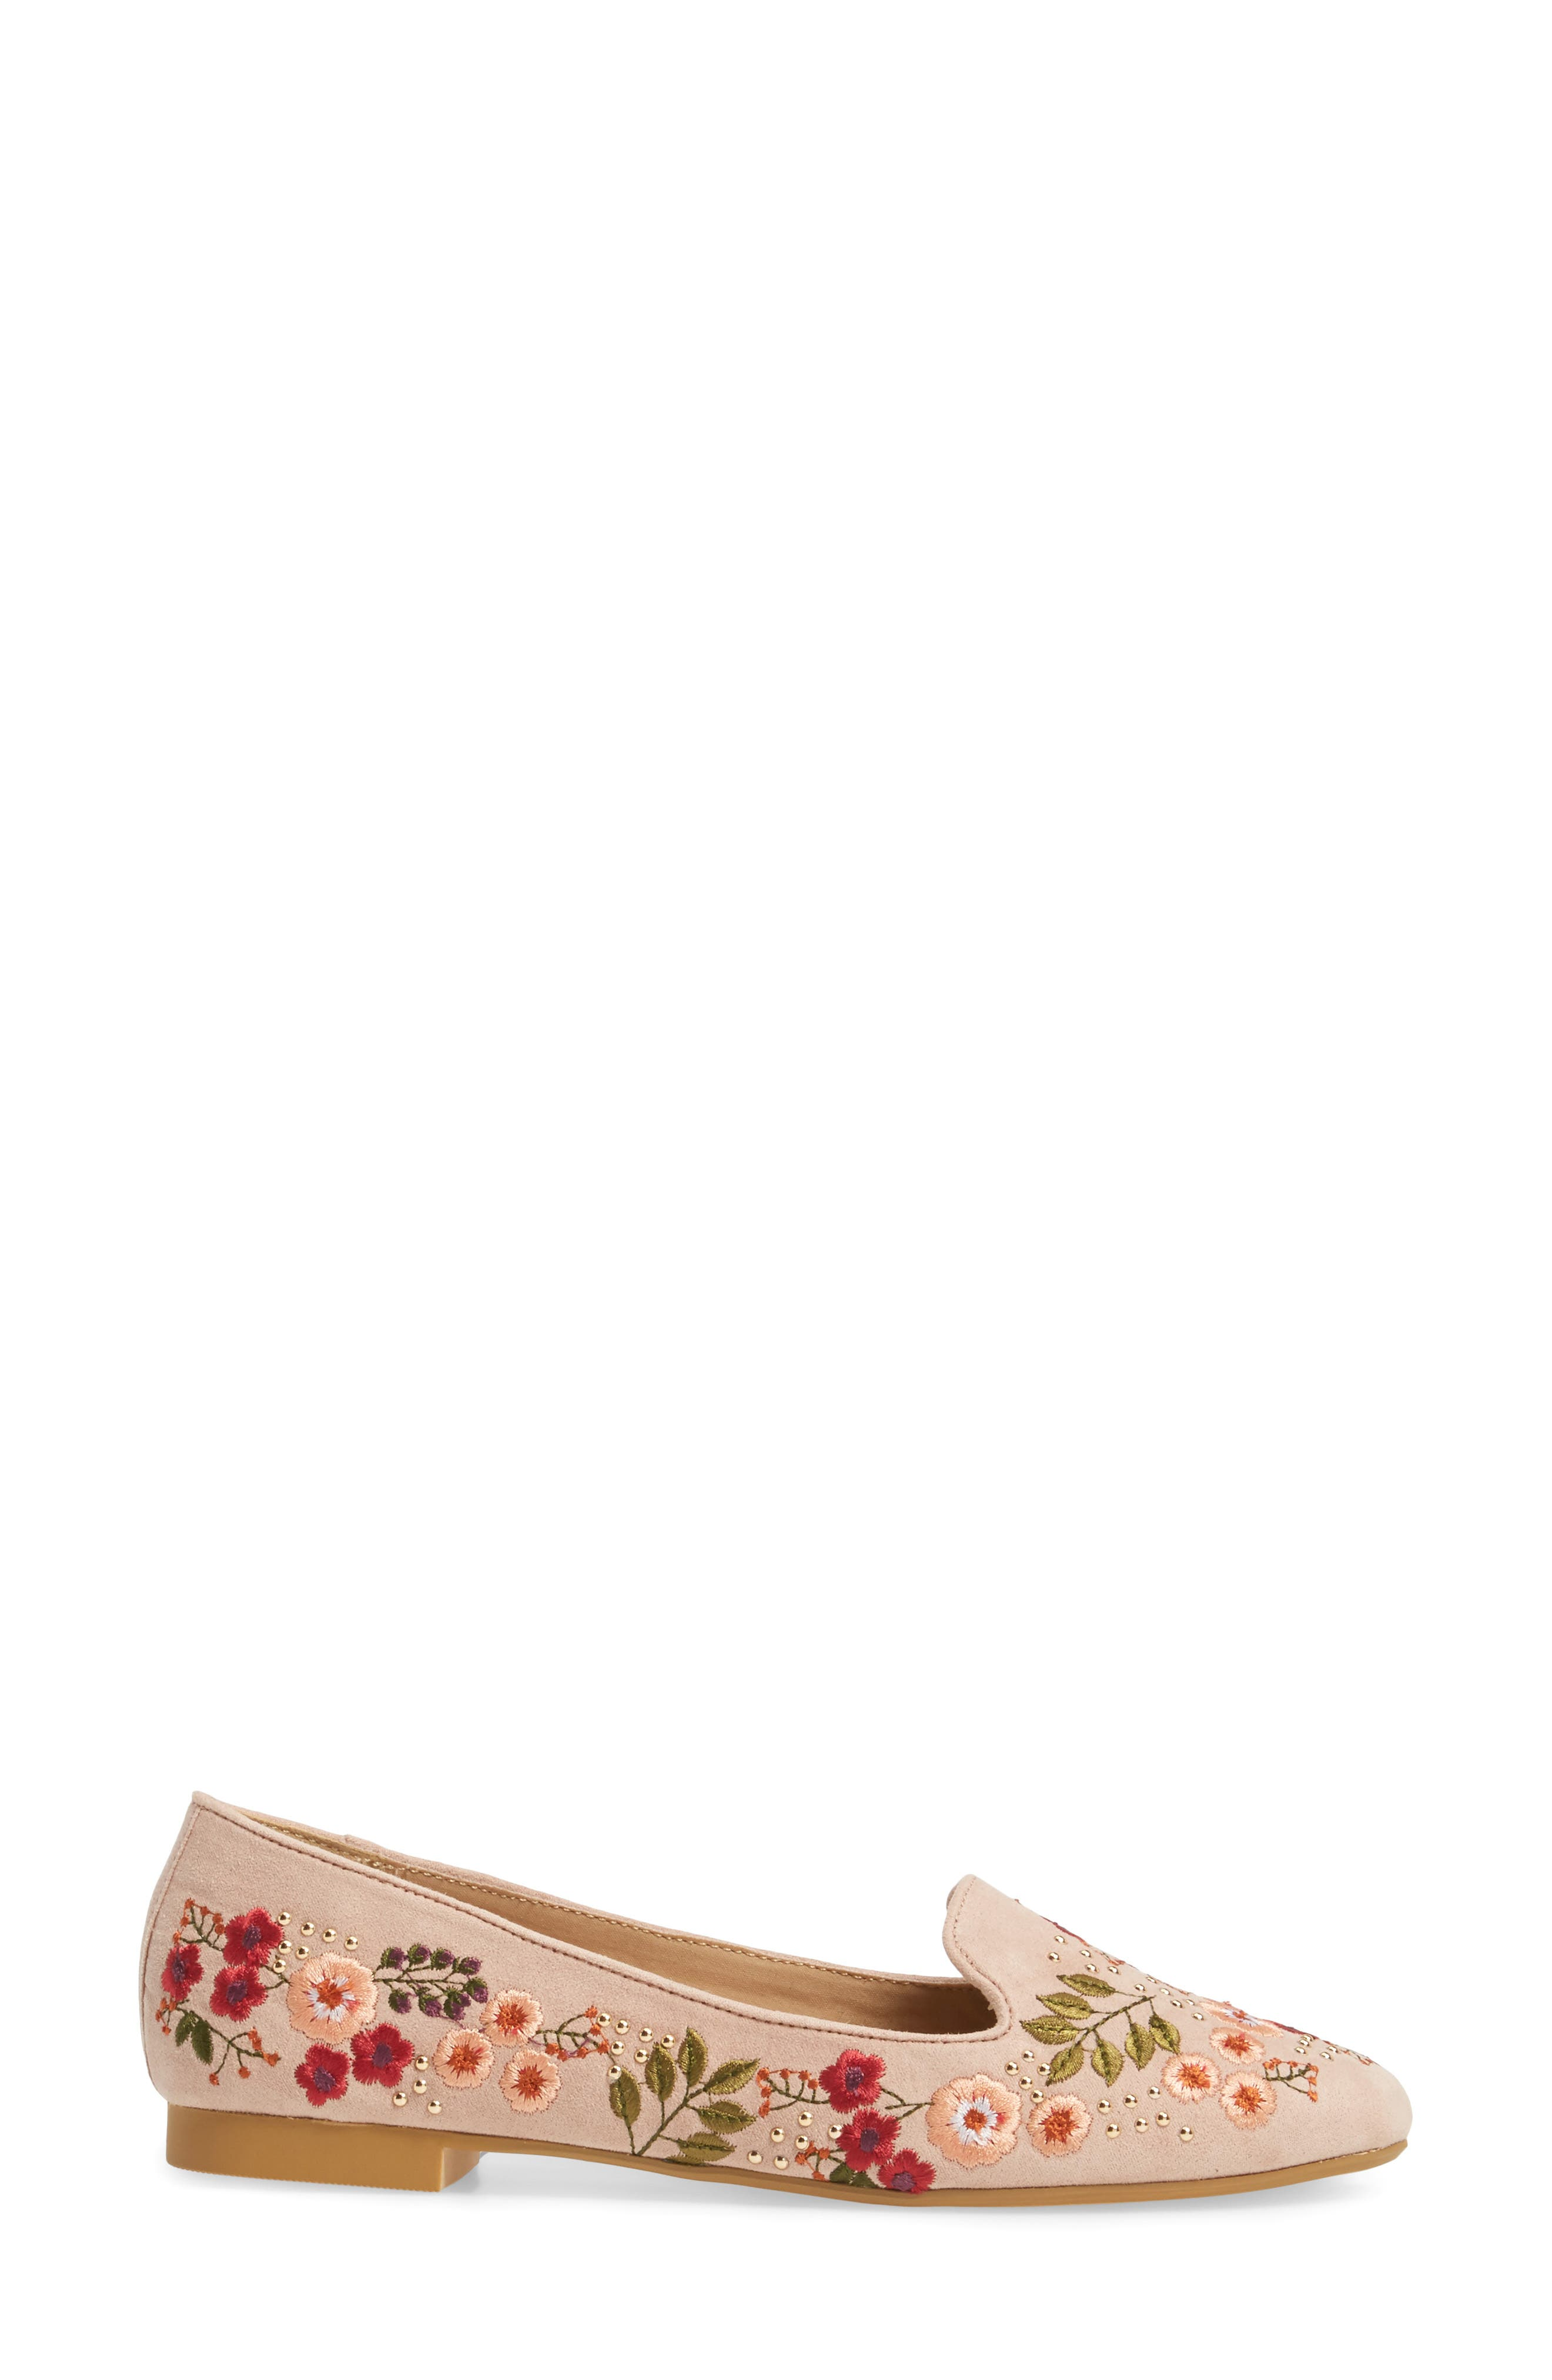 Alternate Image 3  - Topshop Sugar Embroidered Smoking Slipper (Women)